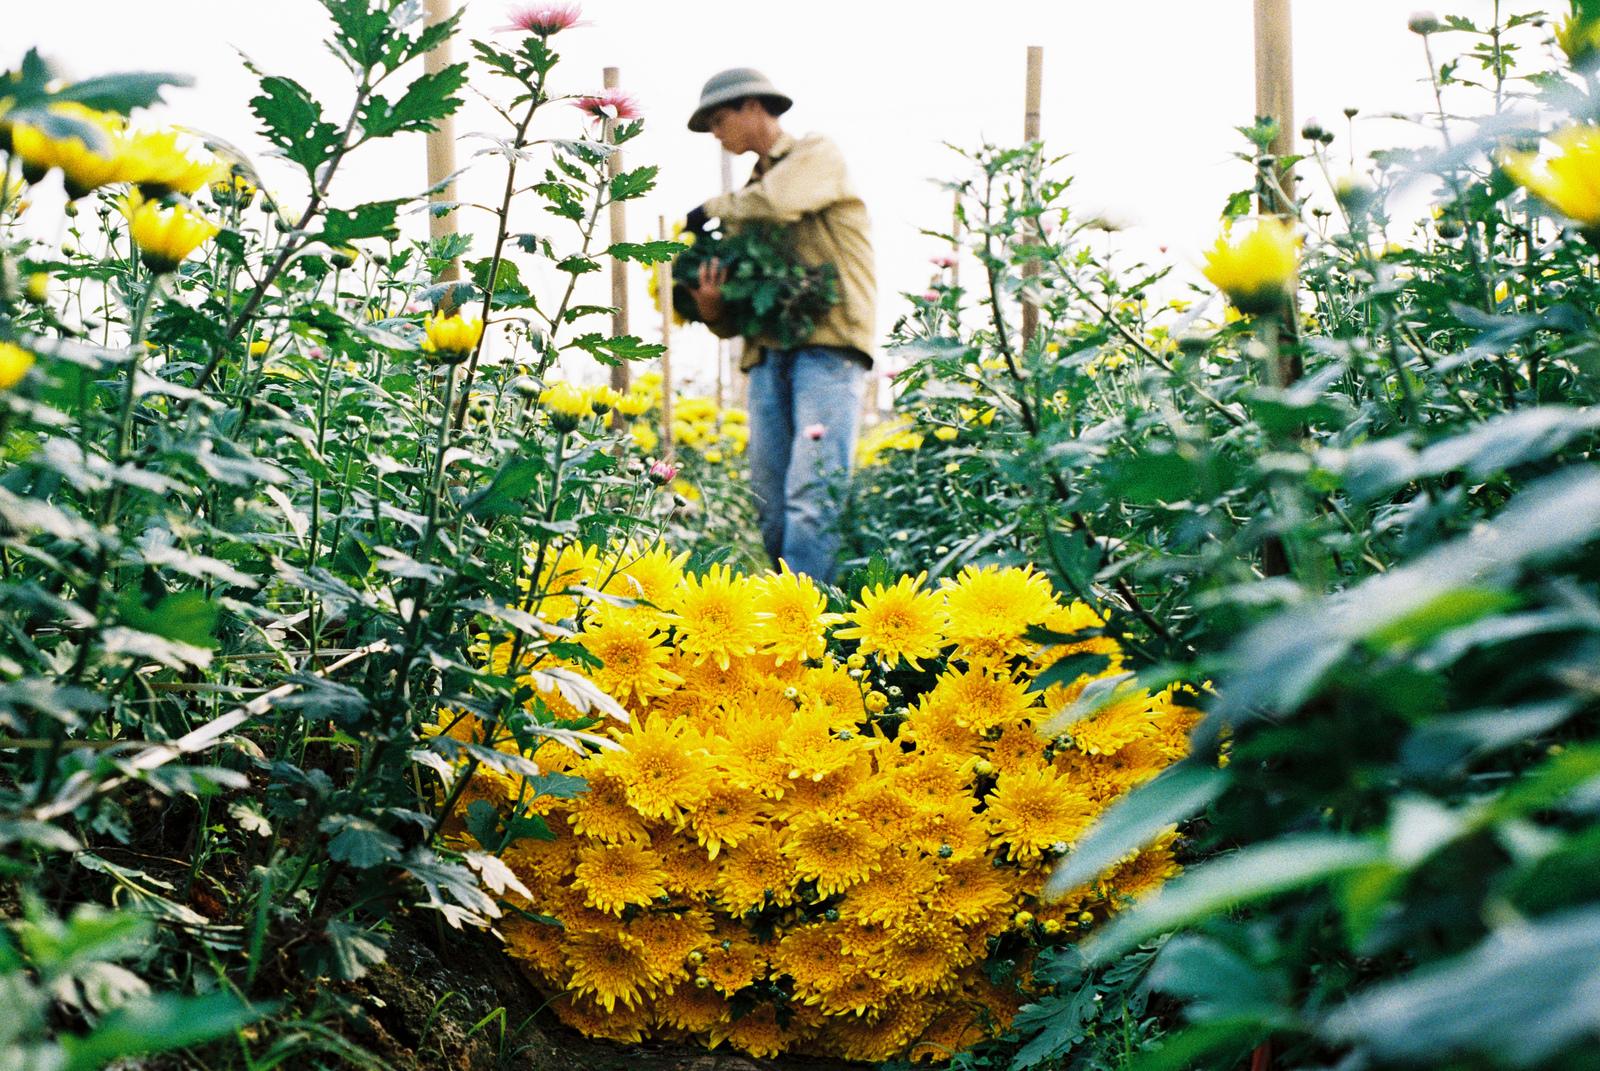 Tay Tuu flower garden in Hanoi - hanoi day trips